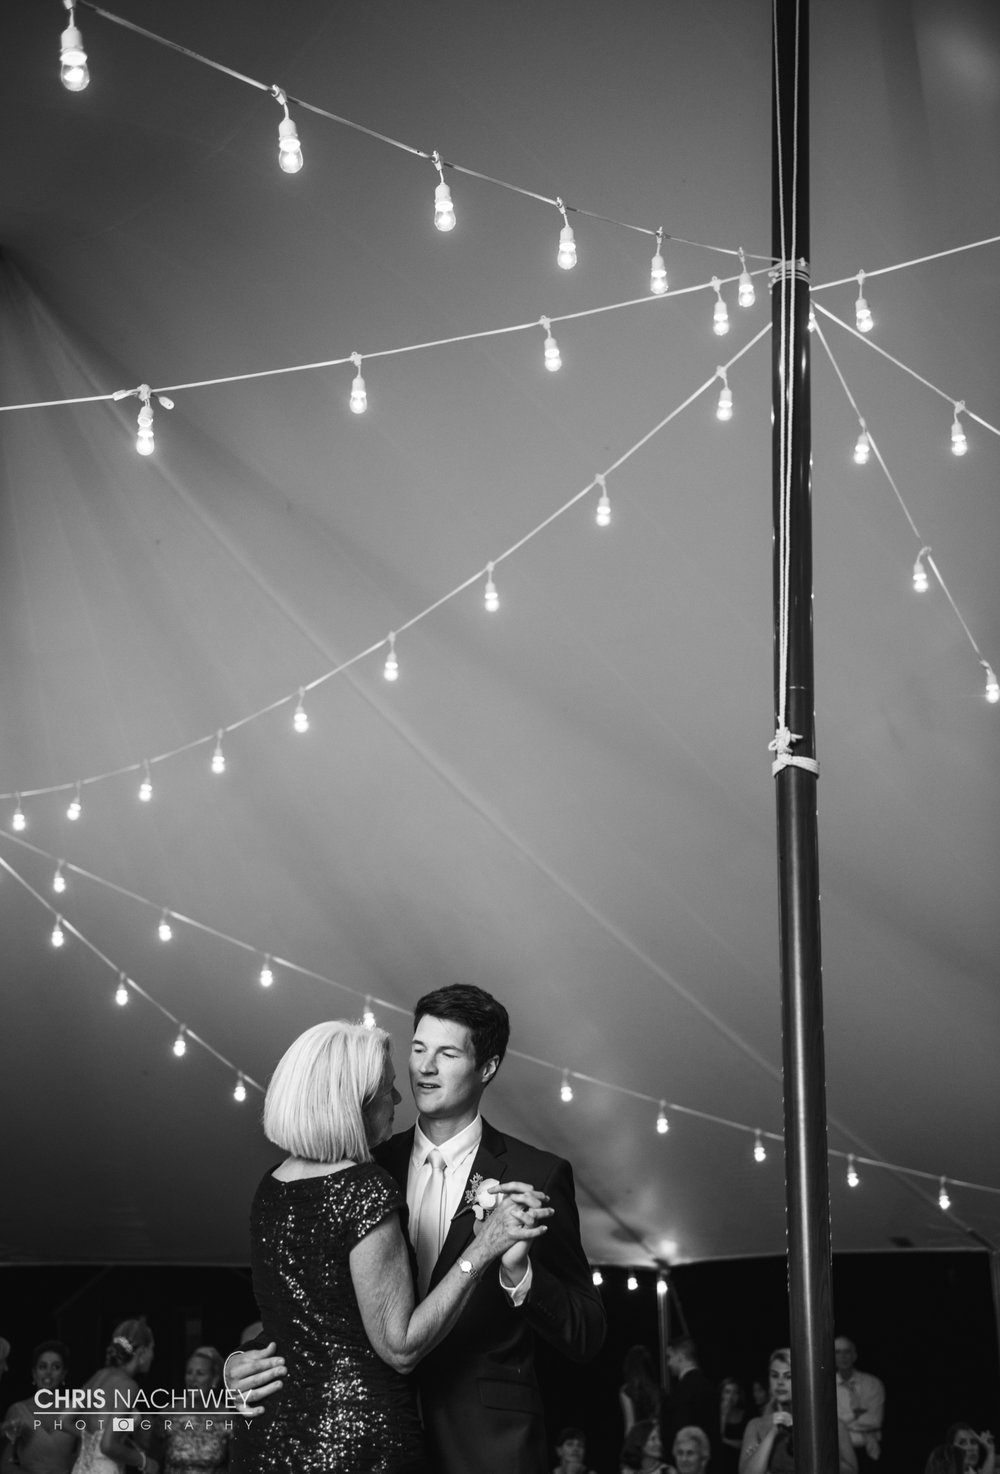 artistic-connecticut-wedding-photographers-chris-nachtwey-2017-18.jpg